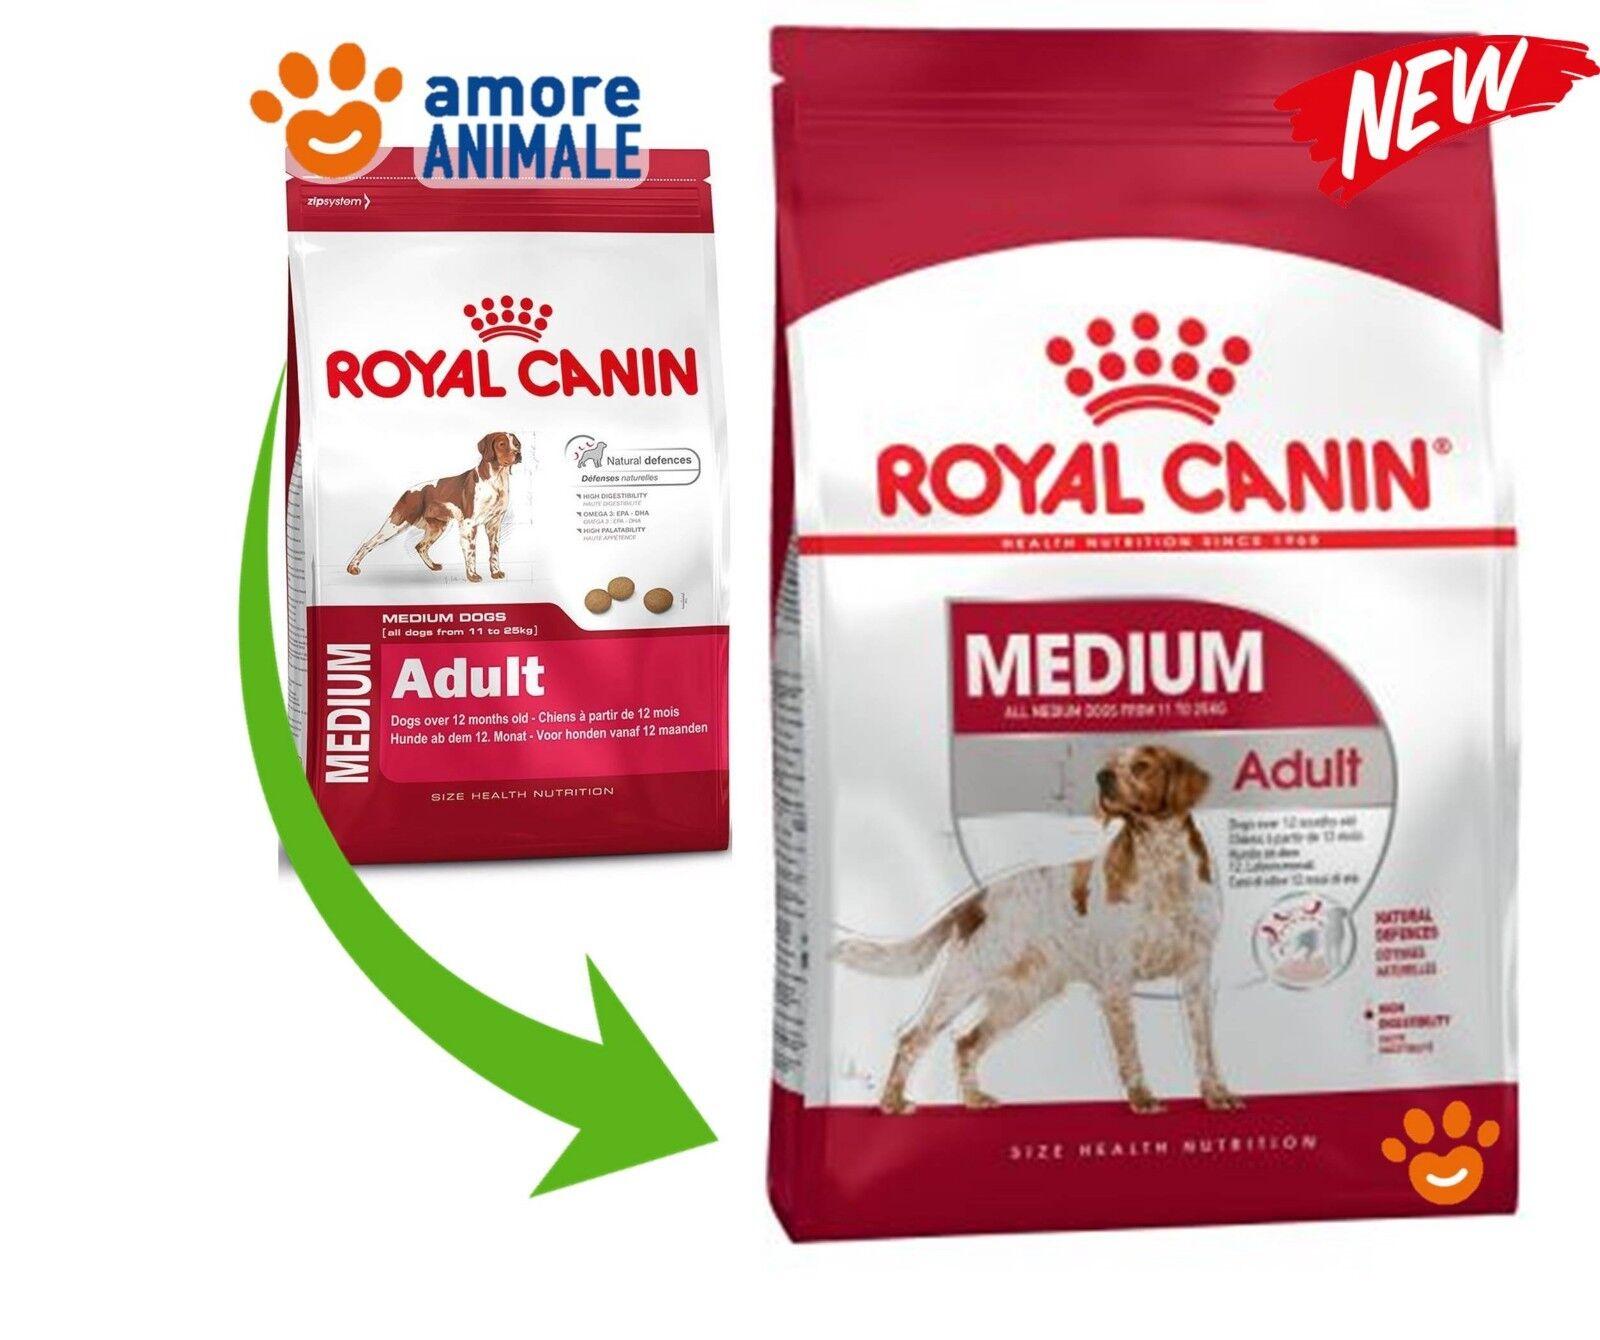 Royal Canin Medium Adult 15 kg  Crocchette per cane adulto taglia media